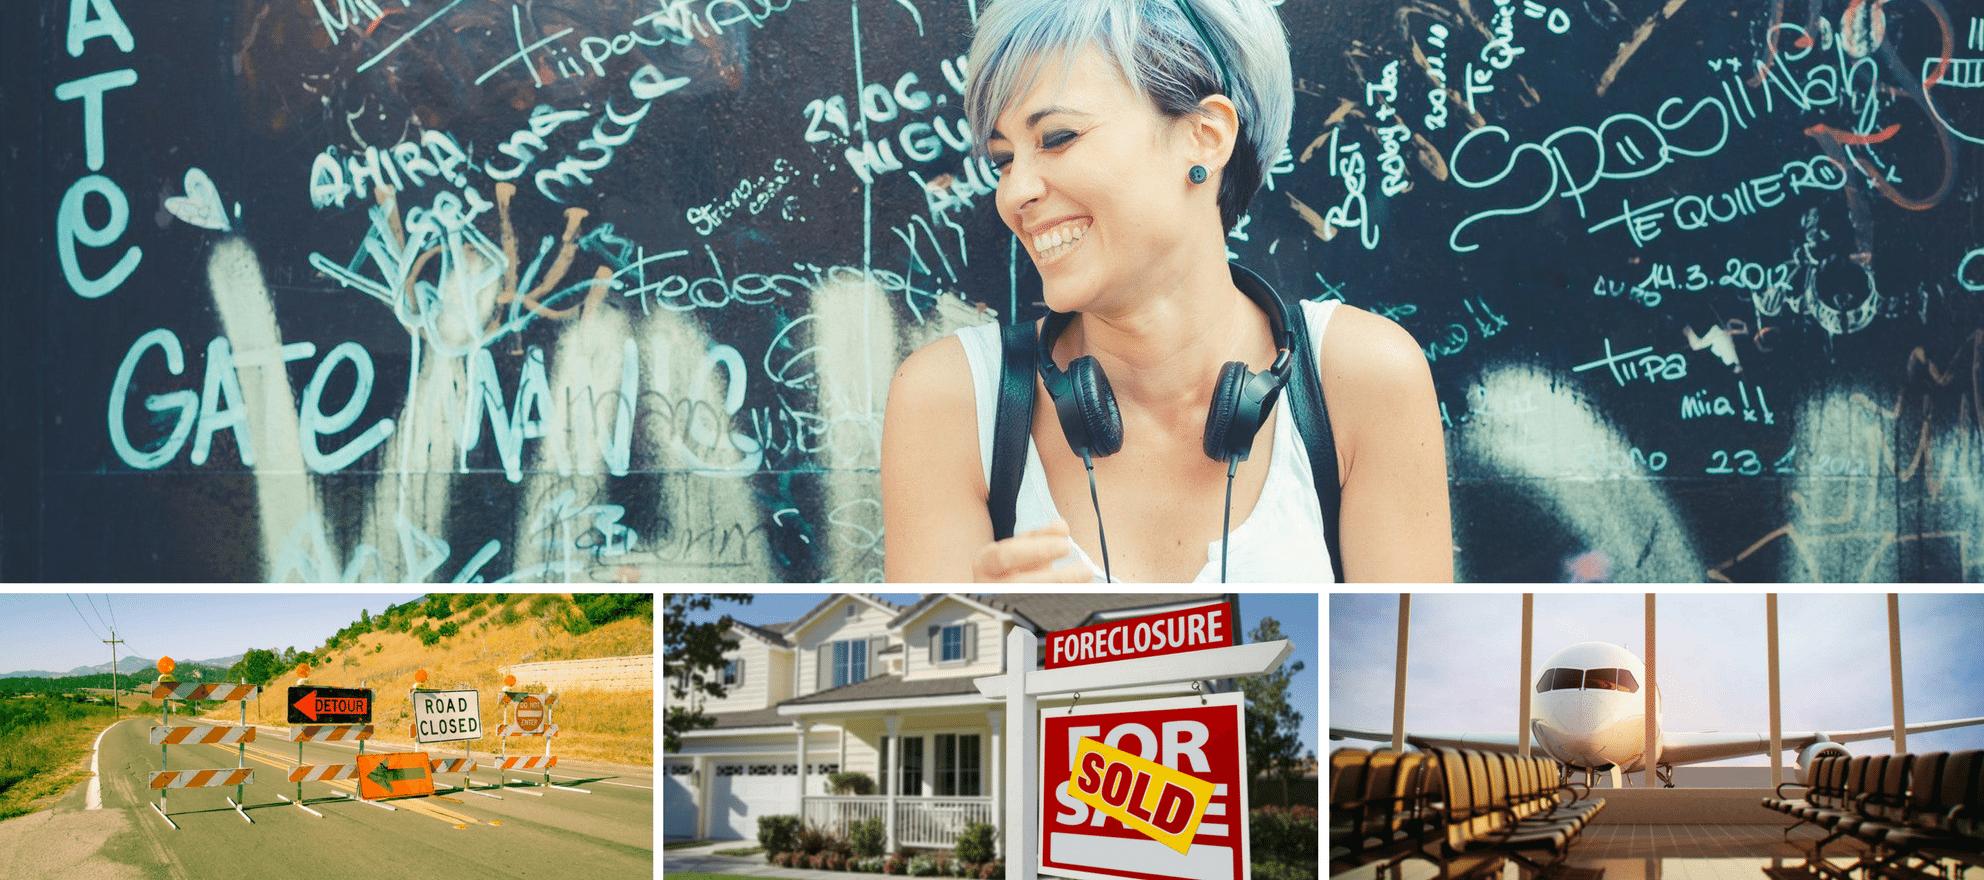 millennial homeownership fears